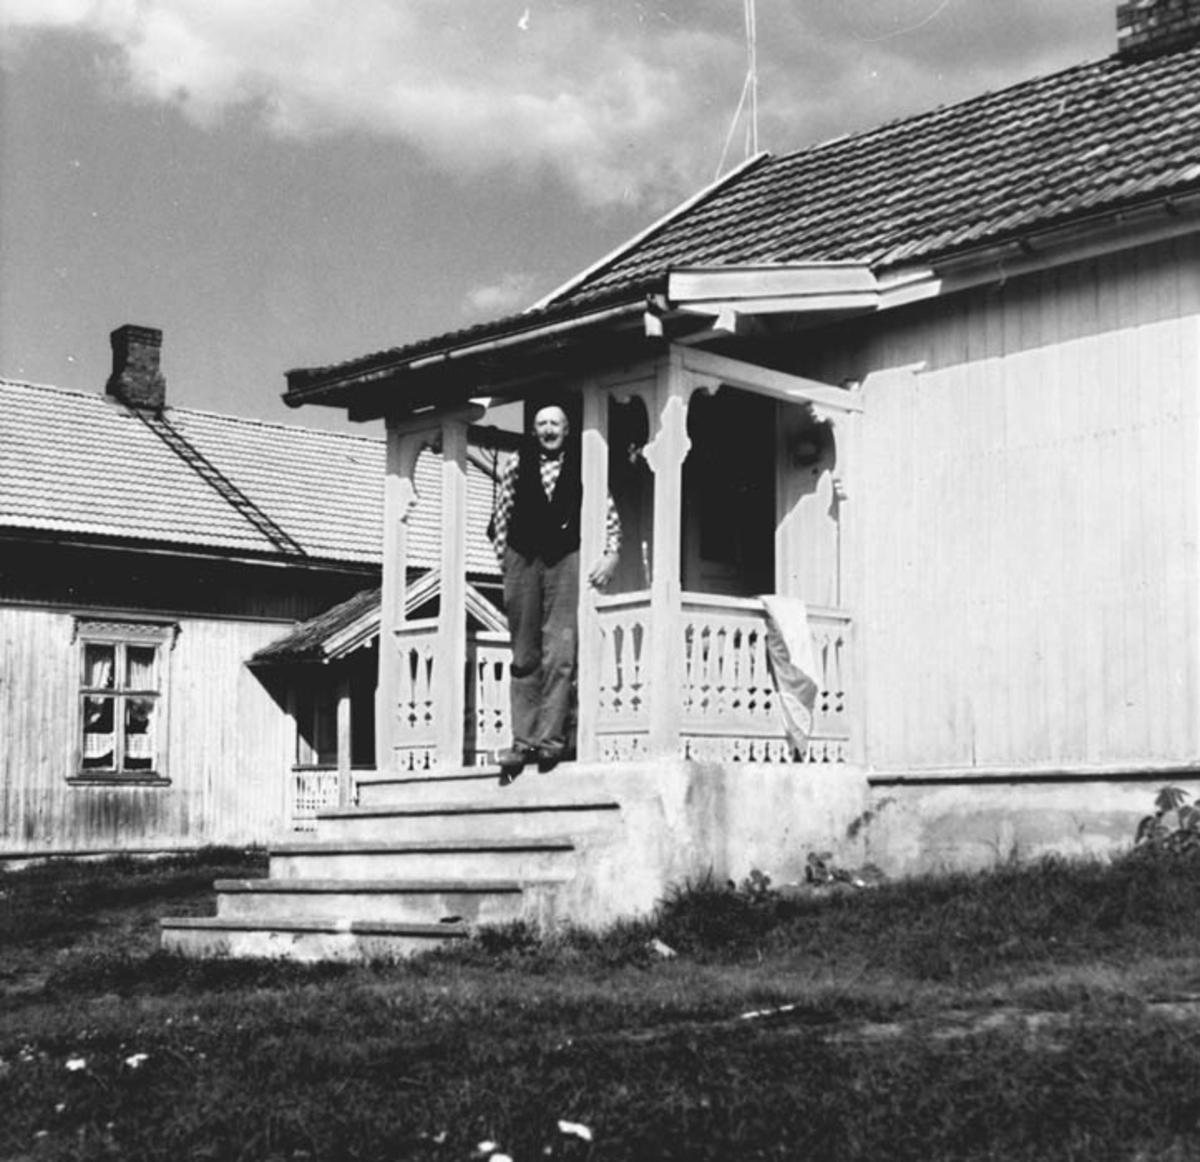 Gamlebyggningen, Olaf Strandengen på trappen.